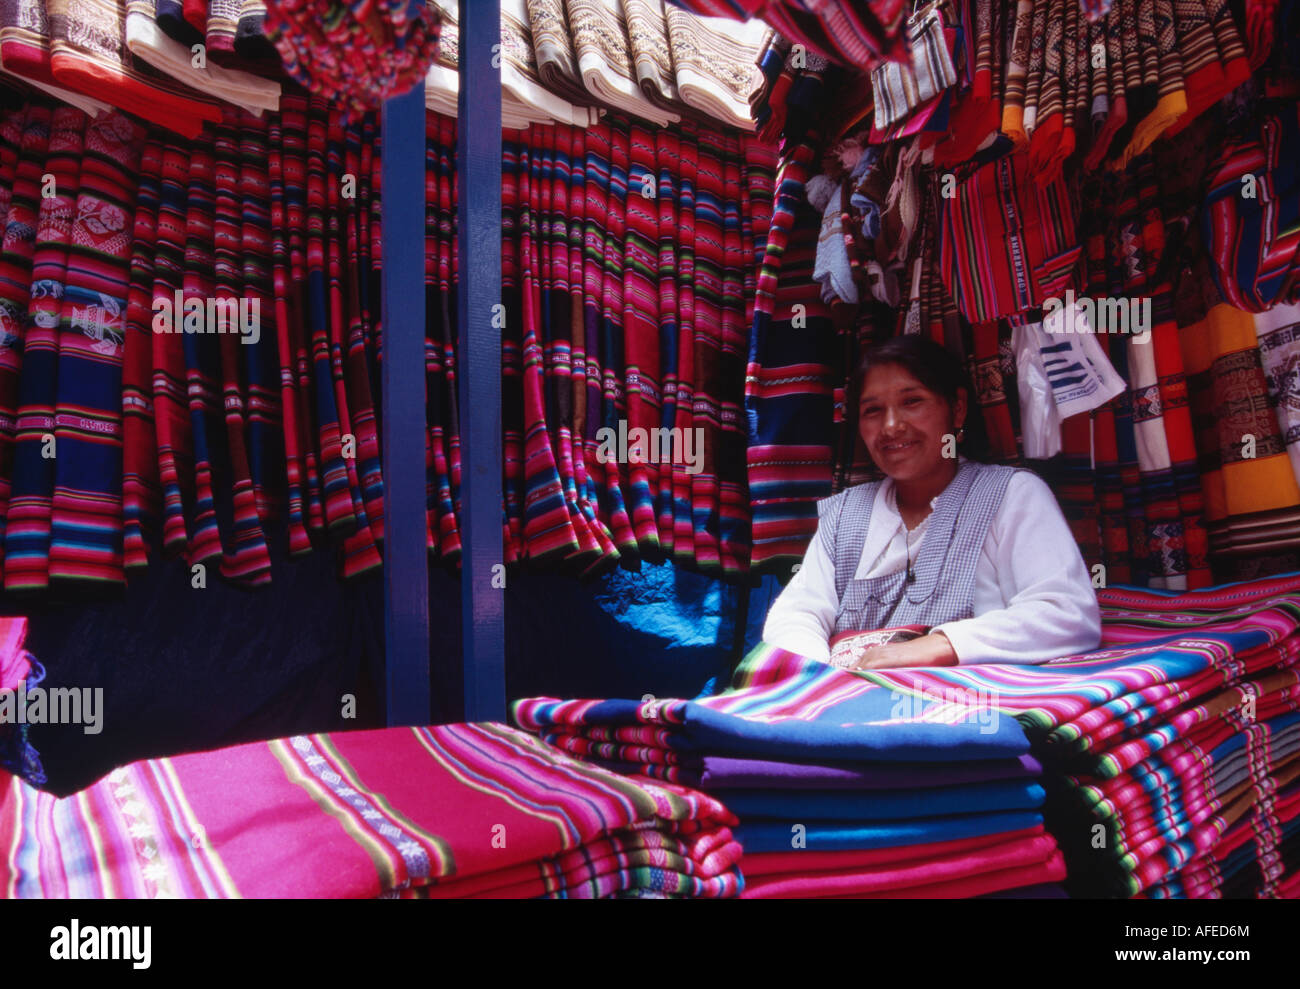 Négociant Textile - Mercado Negro, La Paz, Bolivie Photo Stock